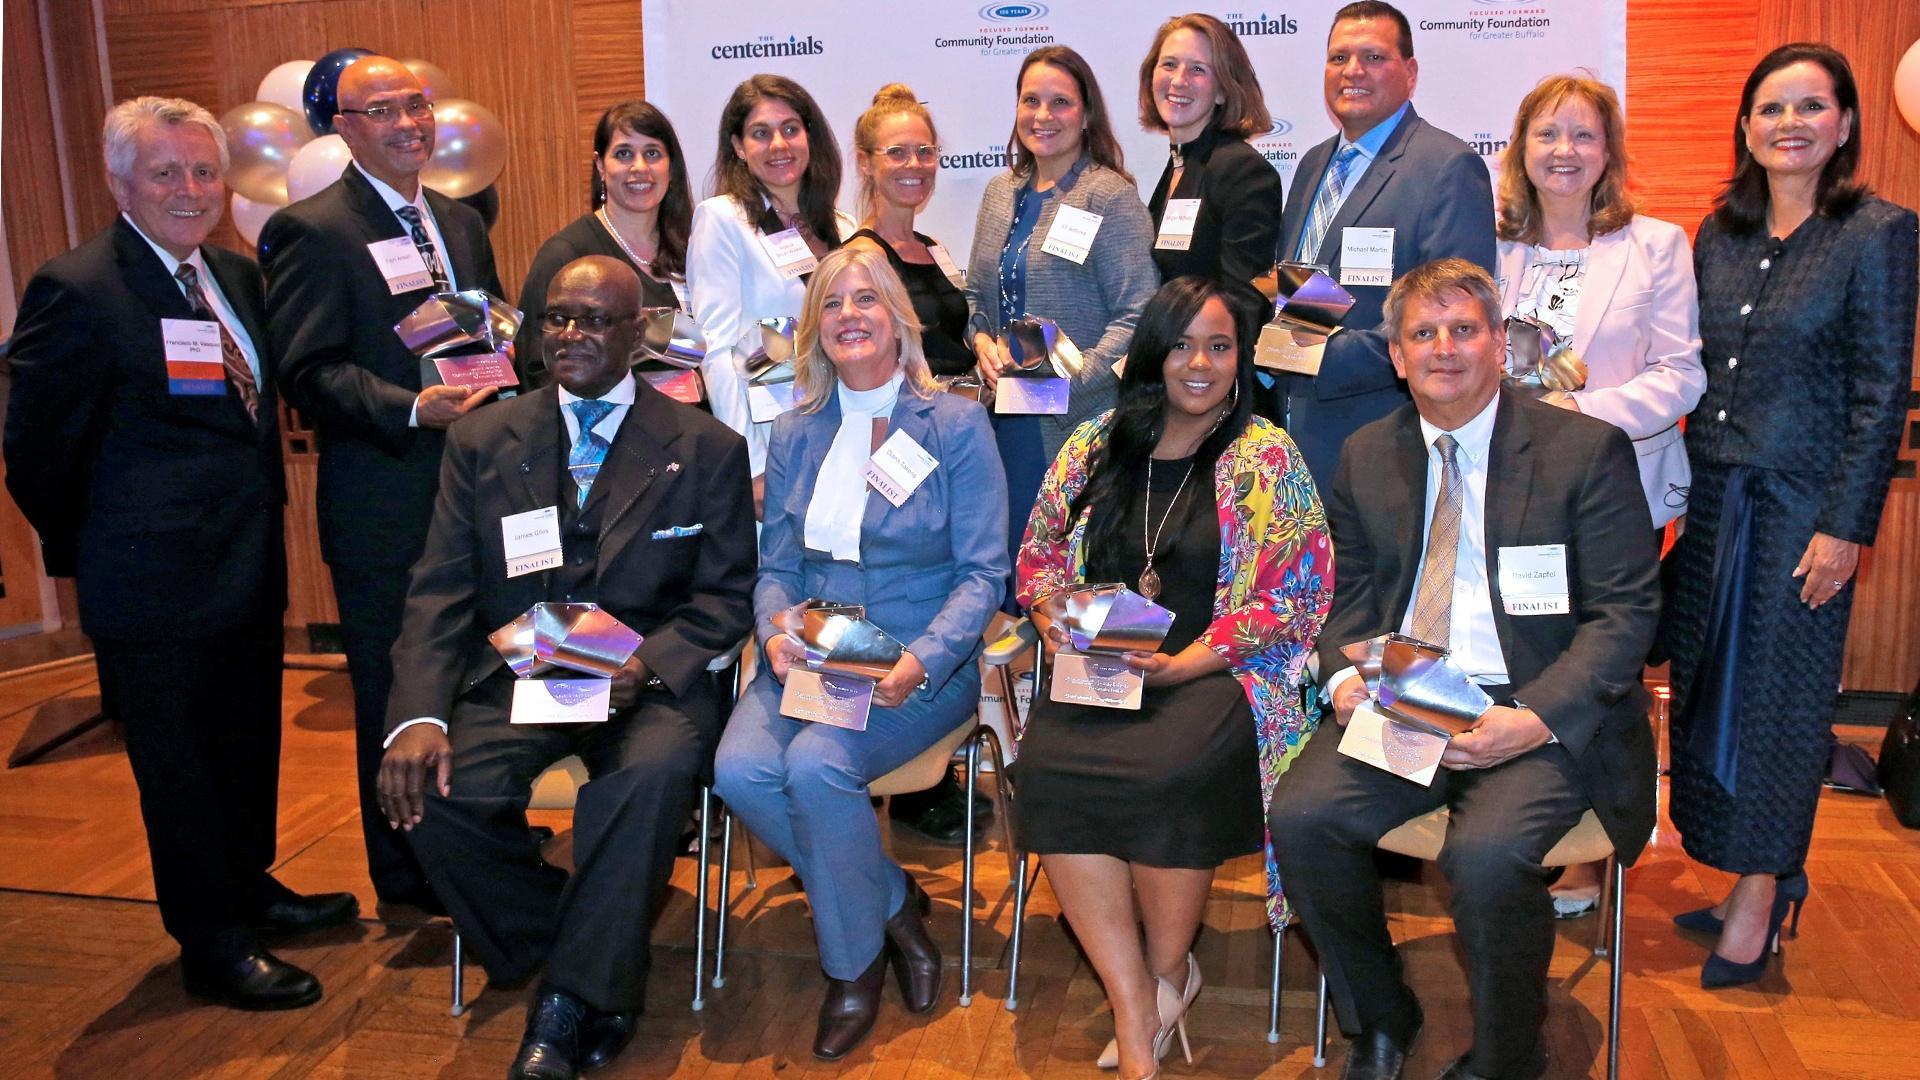 Centennials Finalists pose for a group photo